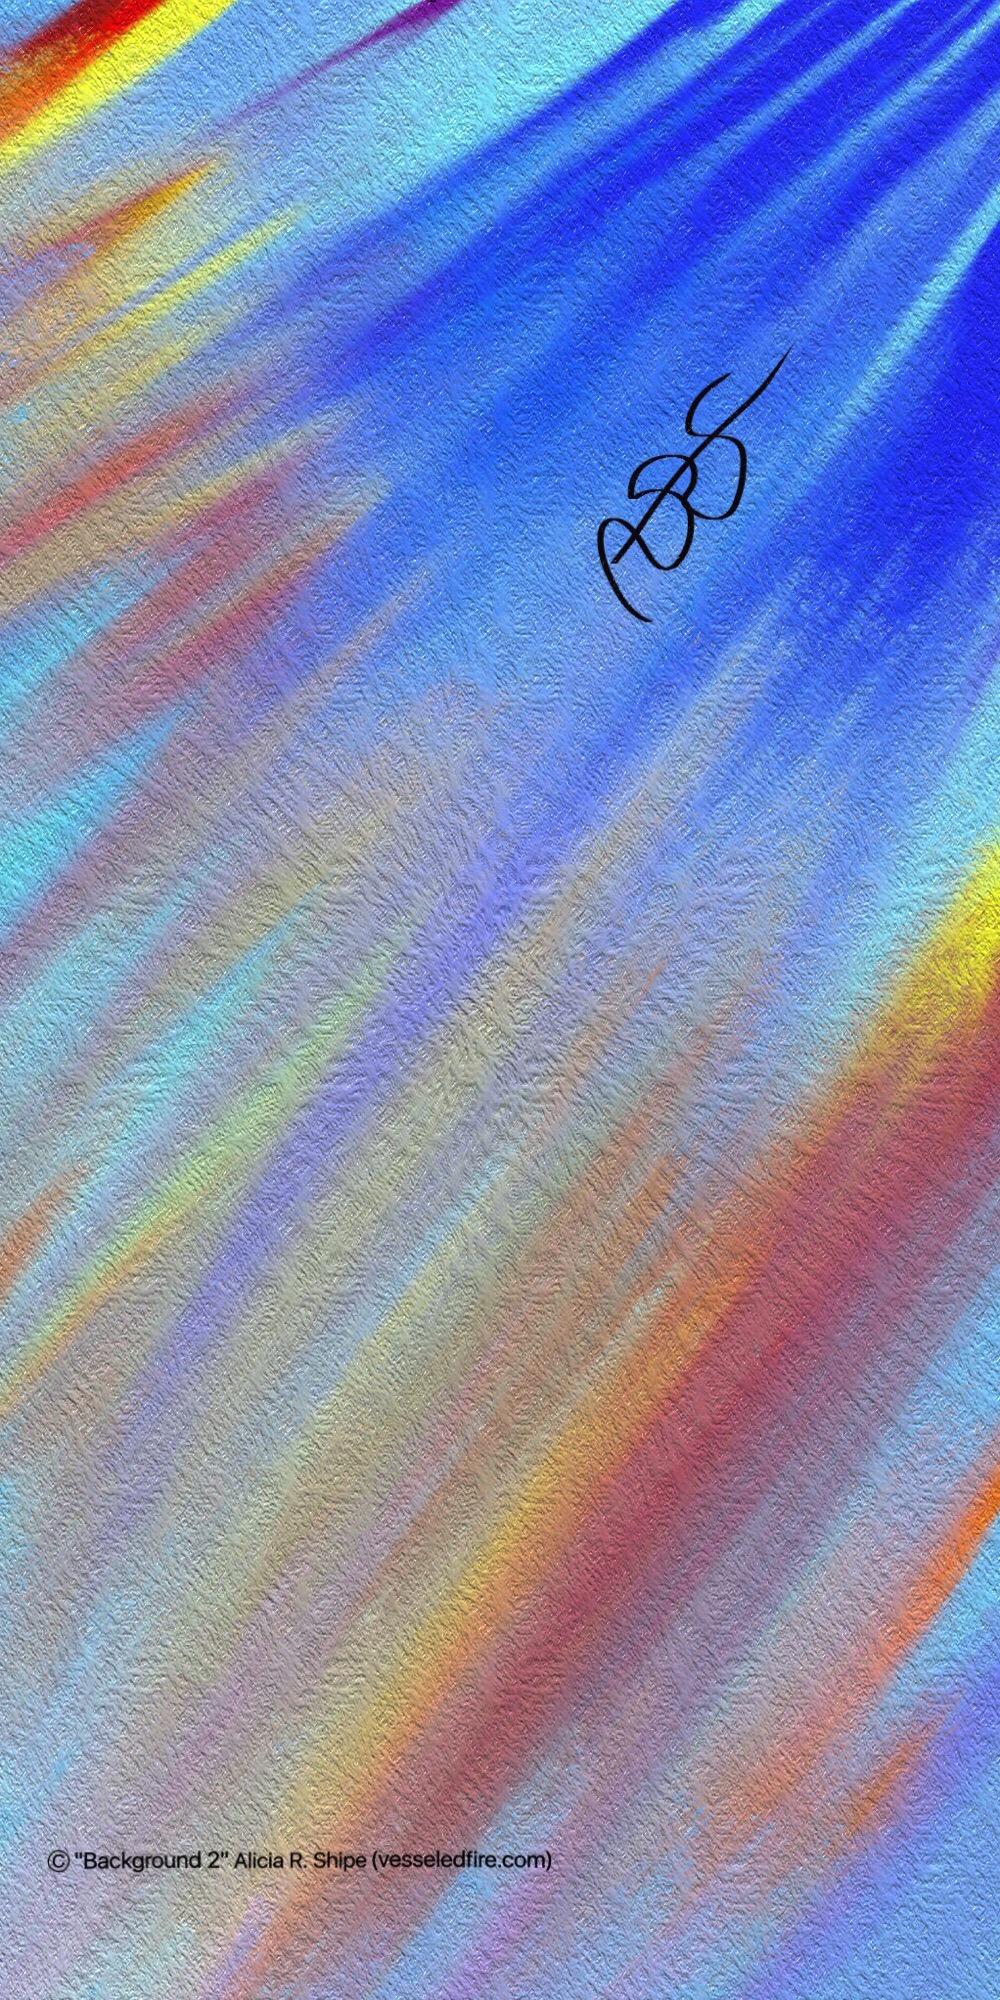 Background 2 Digital Art: 10x20: ARS